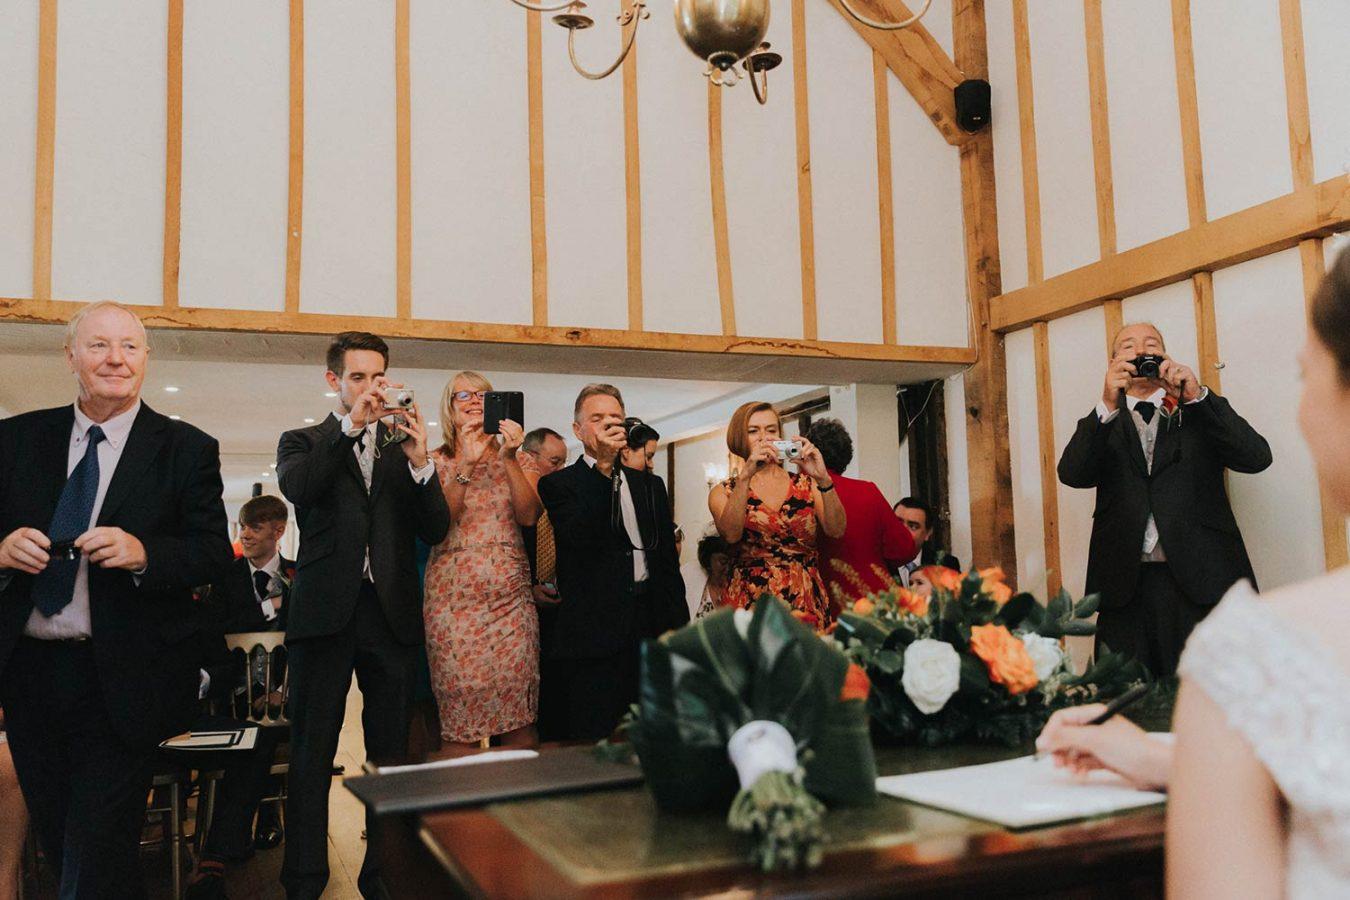 vaulty-manor-wedding-photography-090